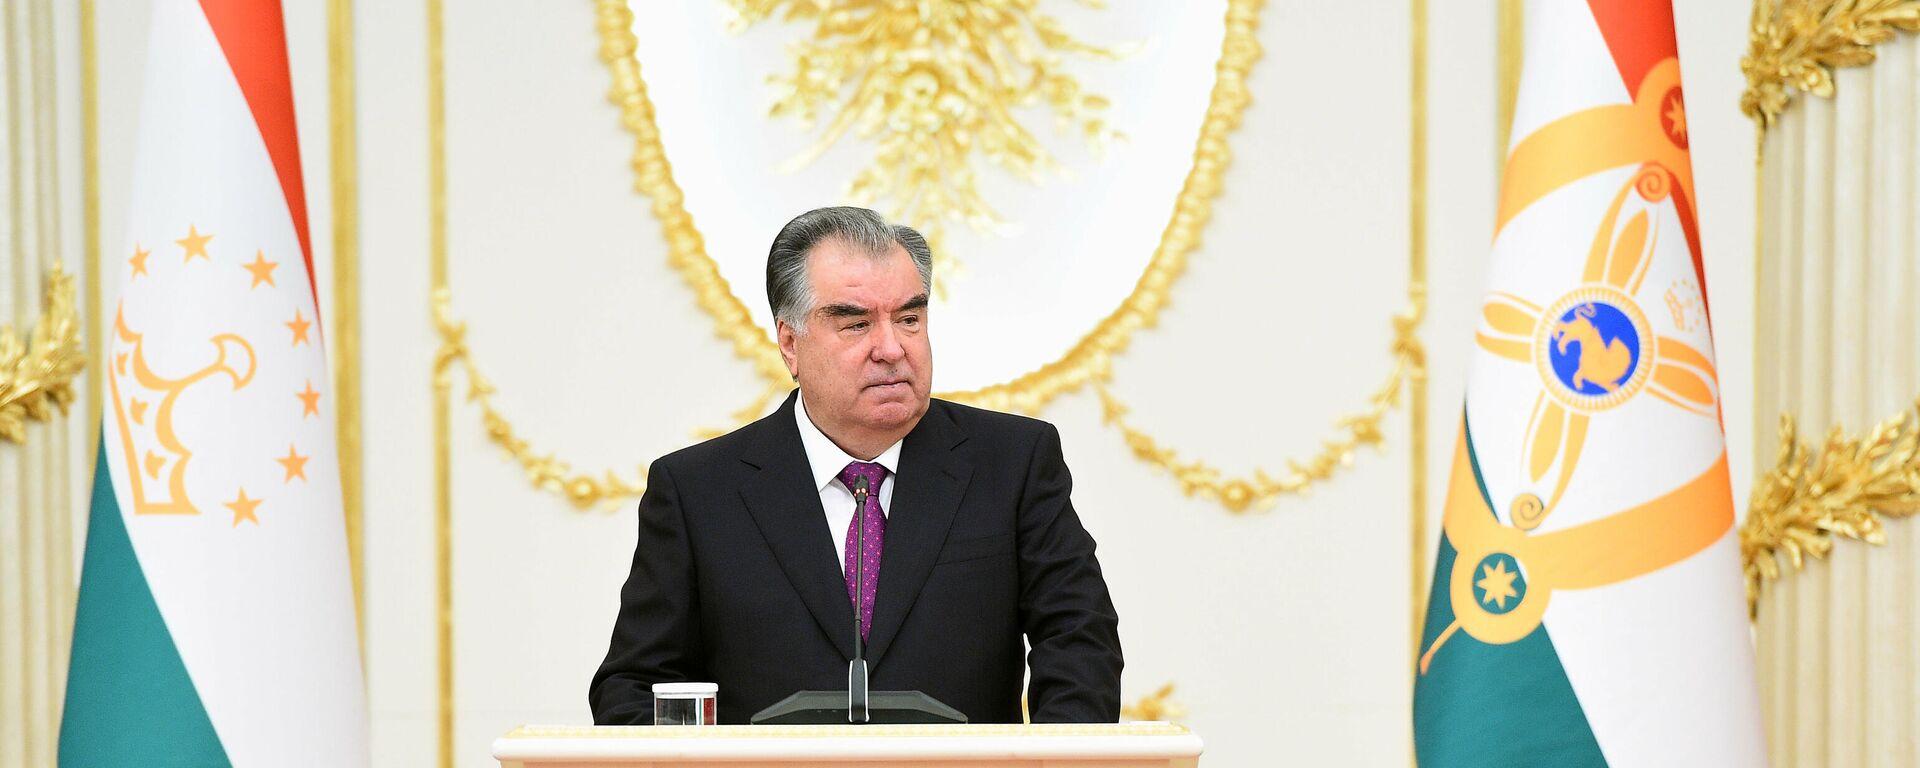 Президент Республики Таджикистан Эмомали Рахмон - Sputnik Тоҷикистон, 1920, 28.09.2021